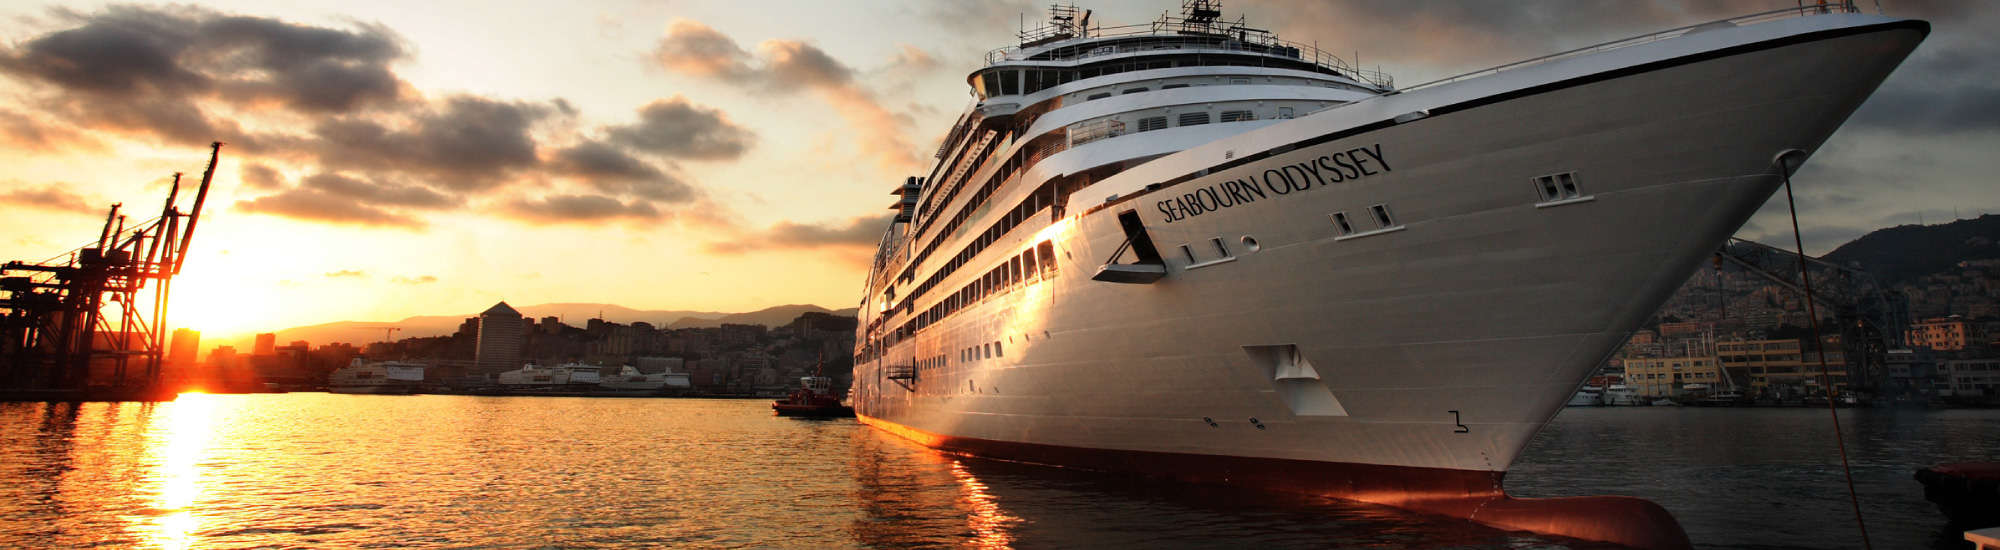 Mariotti Damen Cruises / Portal Stoczniowy